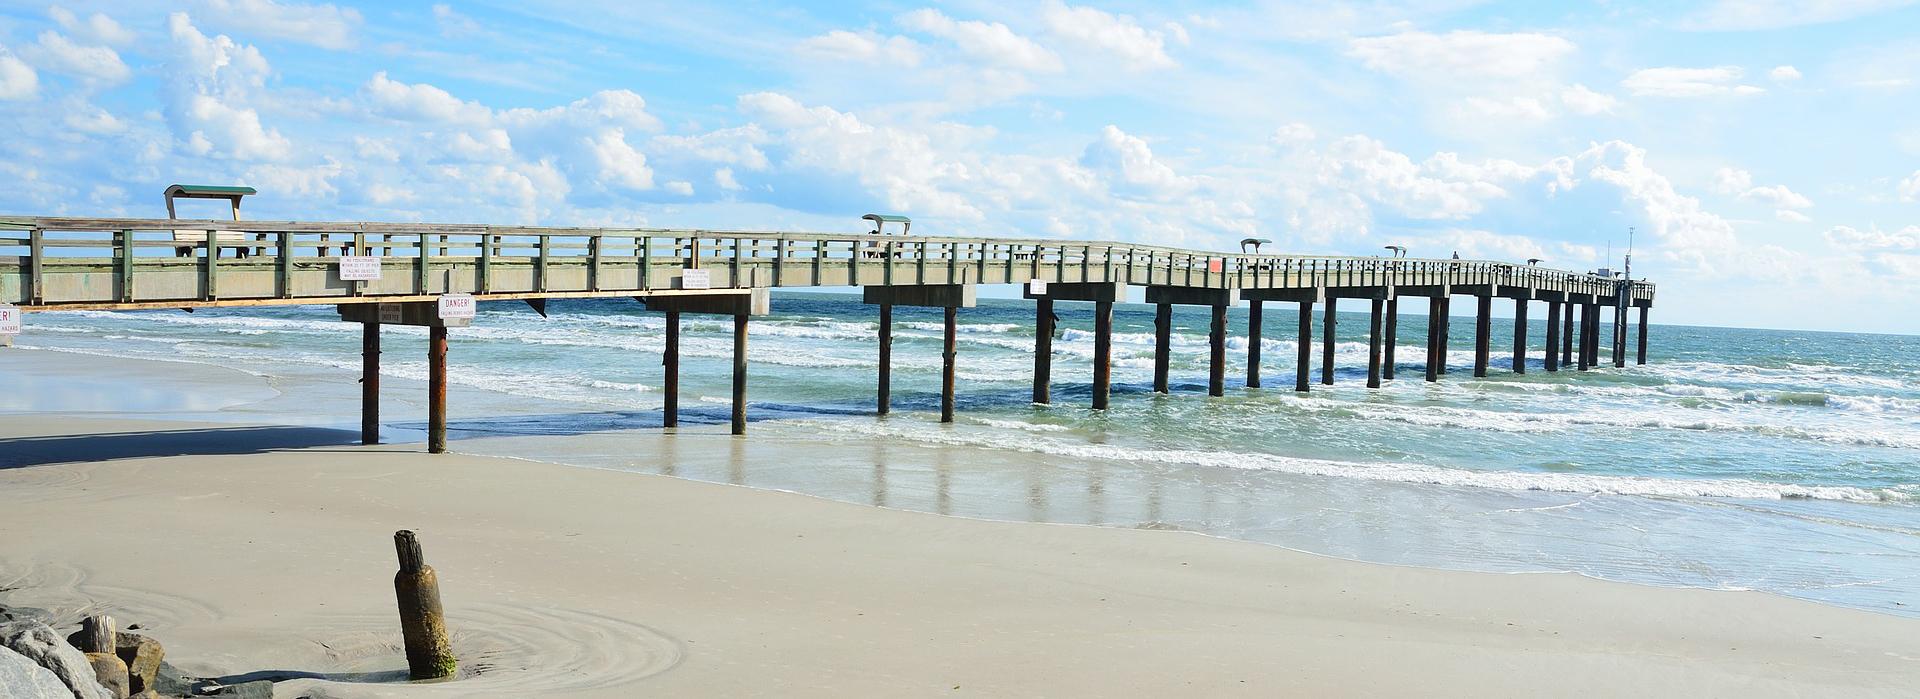 Beach Boardwalk in St. Augustine Florida | Breast Cancer Car Donations